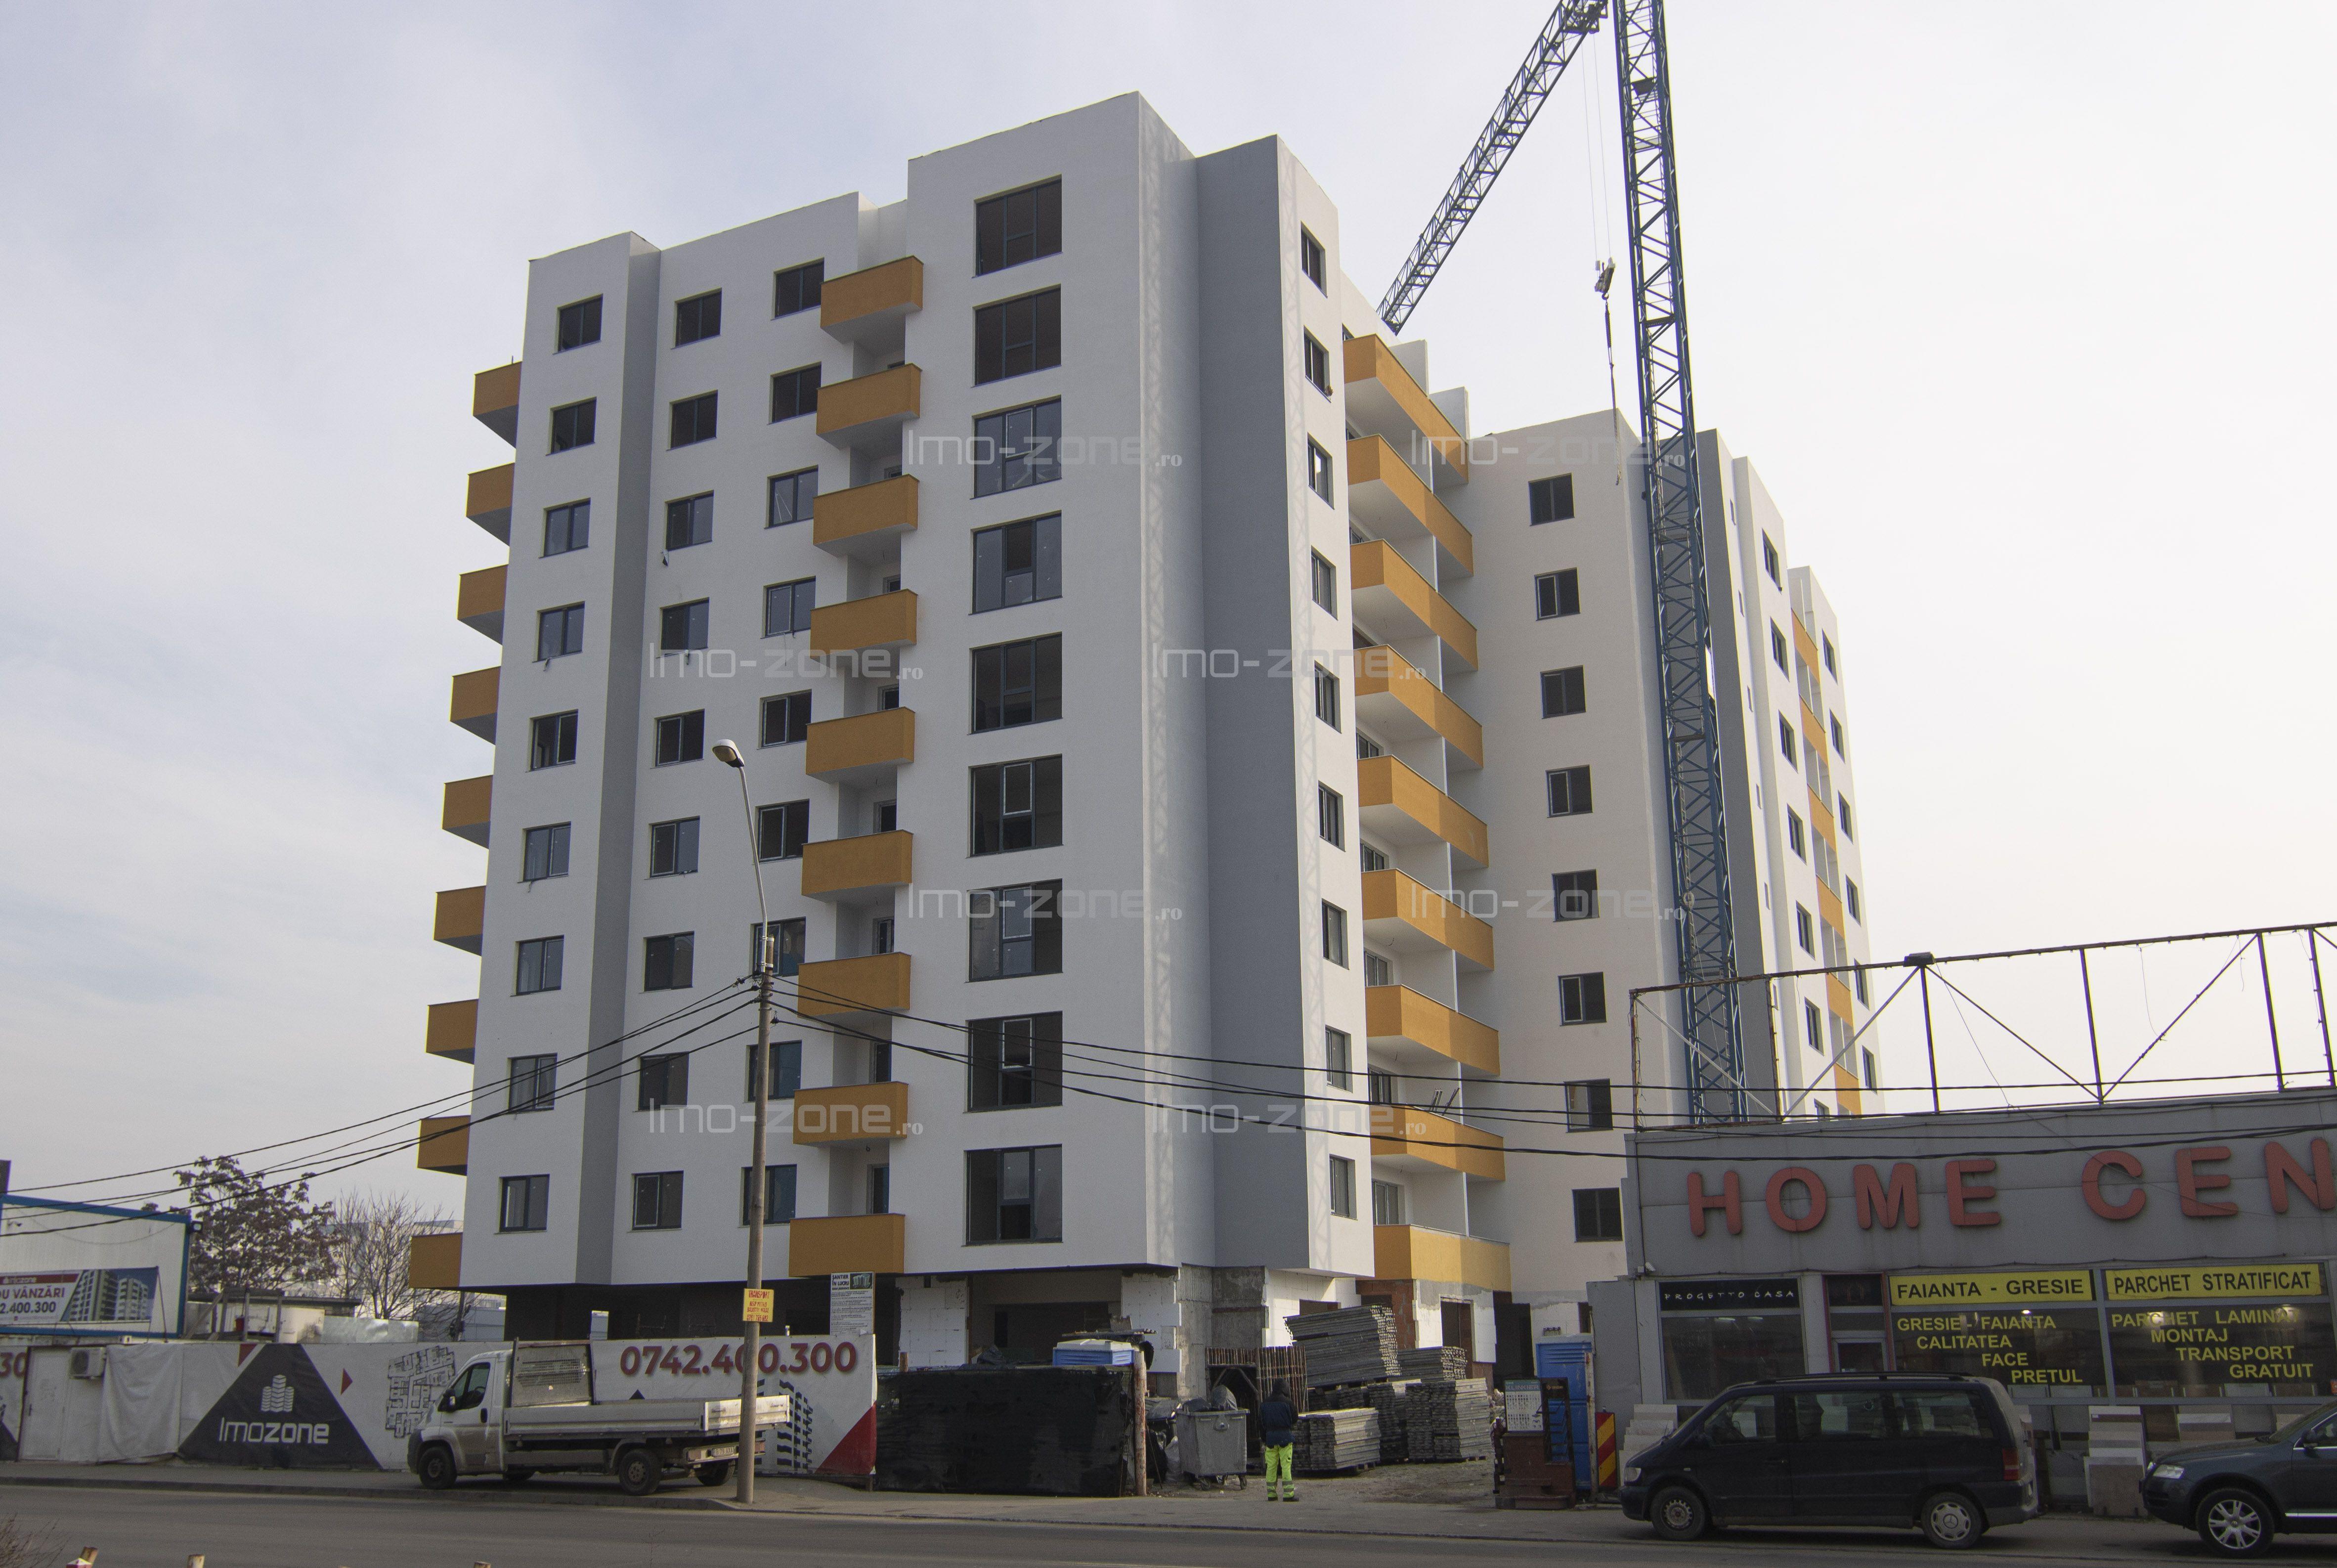 68 mp, localizat langa metrou, MILITARI - PACII, etajul 5, COMISION 0%